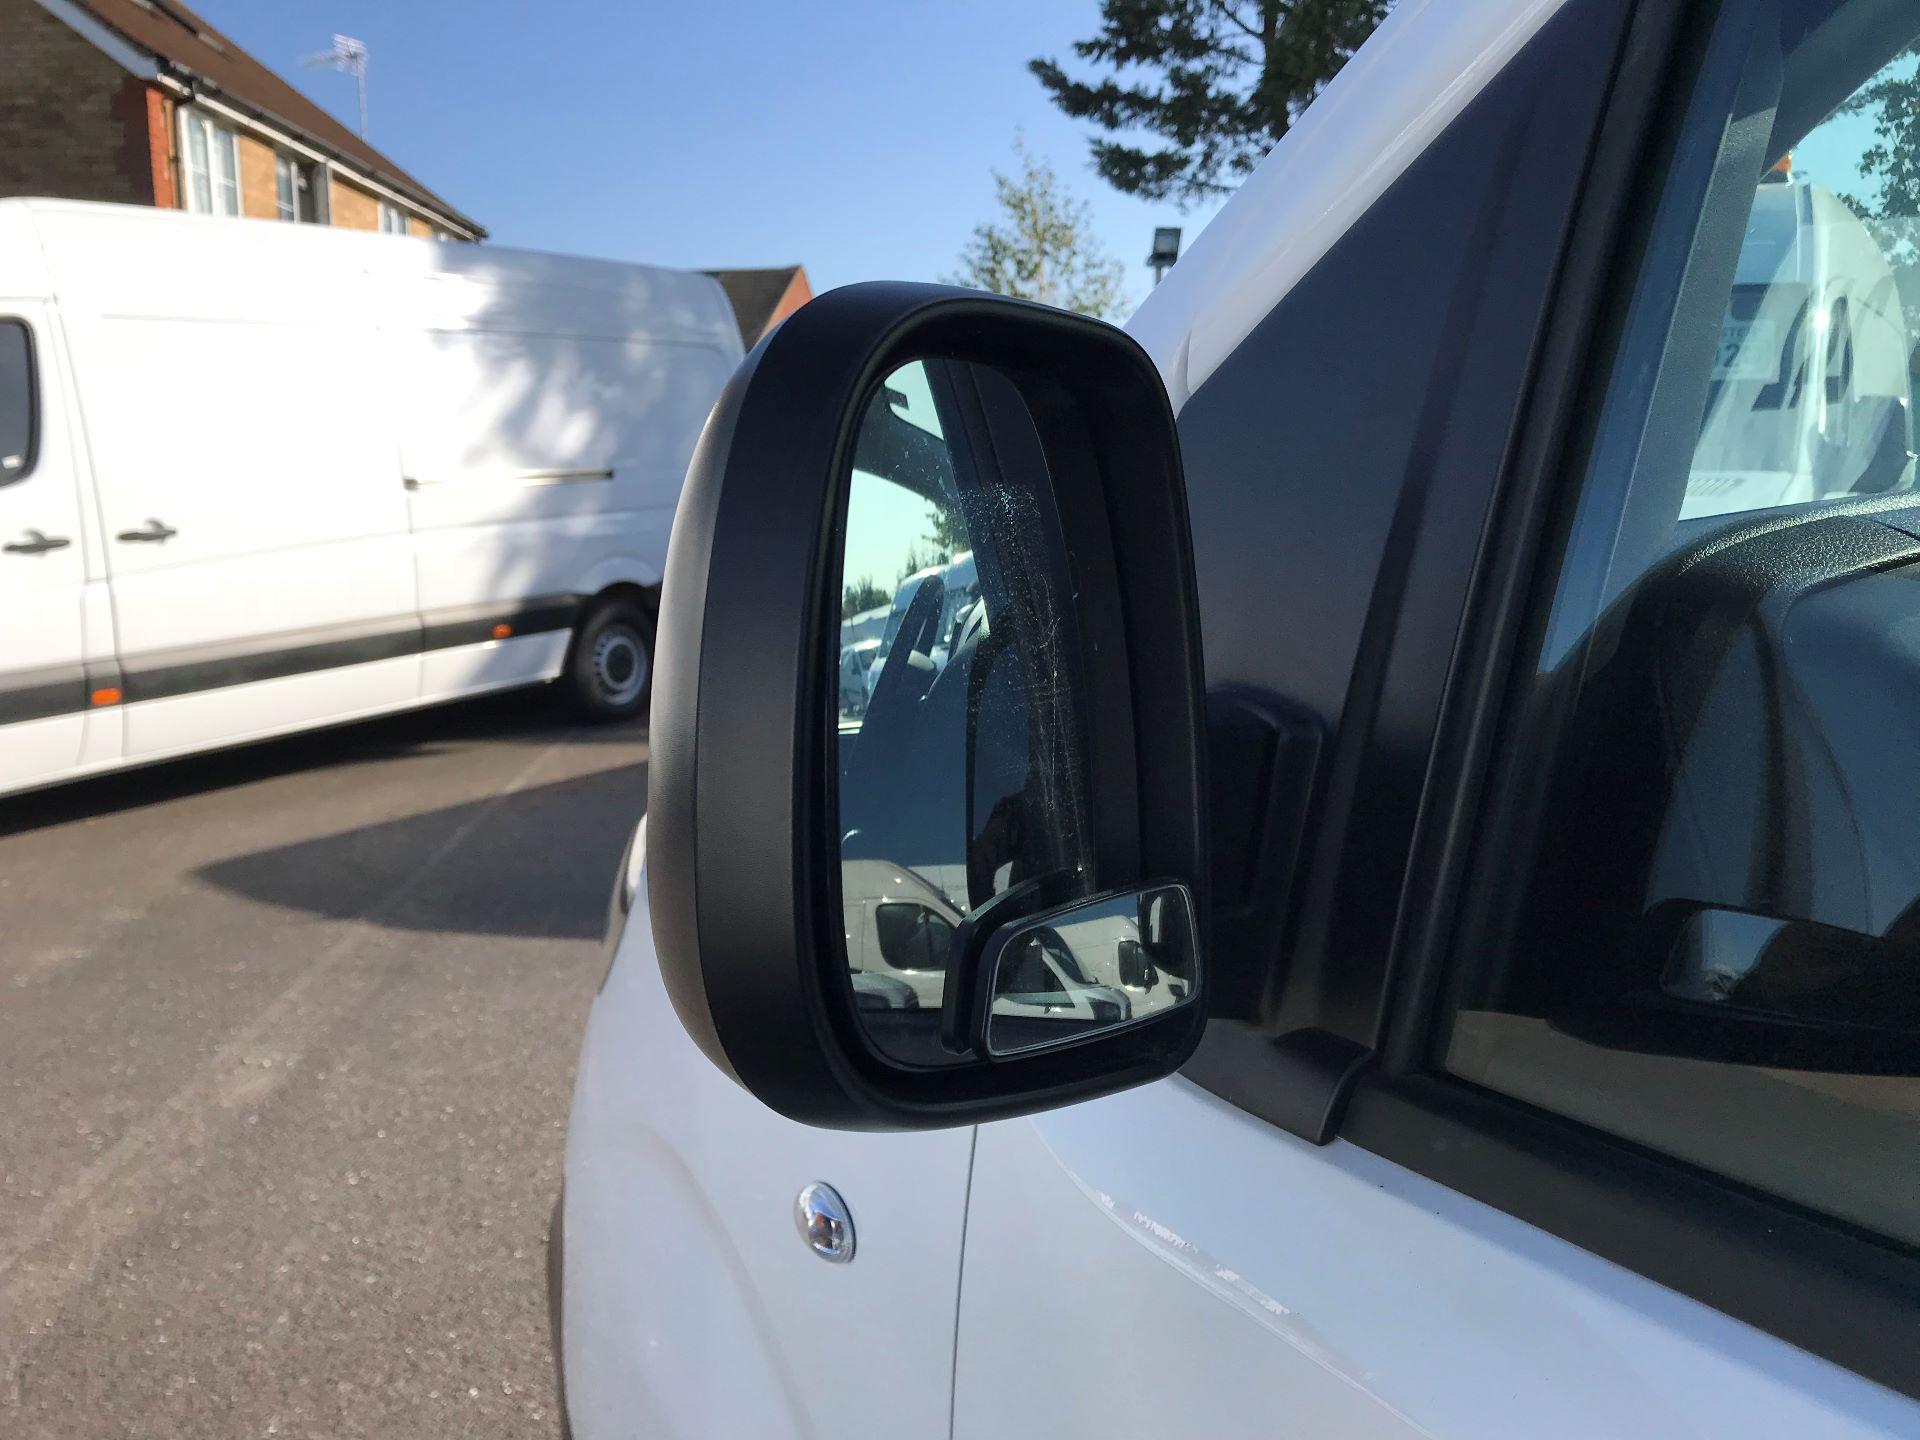 2017 Peugeot Expert STANDARD 1000 1.6 BLUEHDI 95 EURO 6 (NU67LXY) Image 12